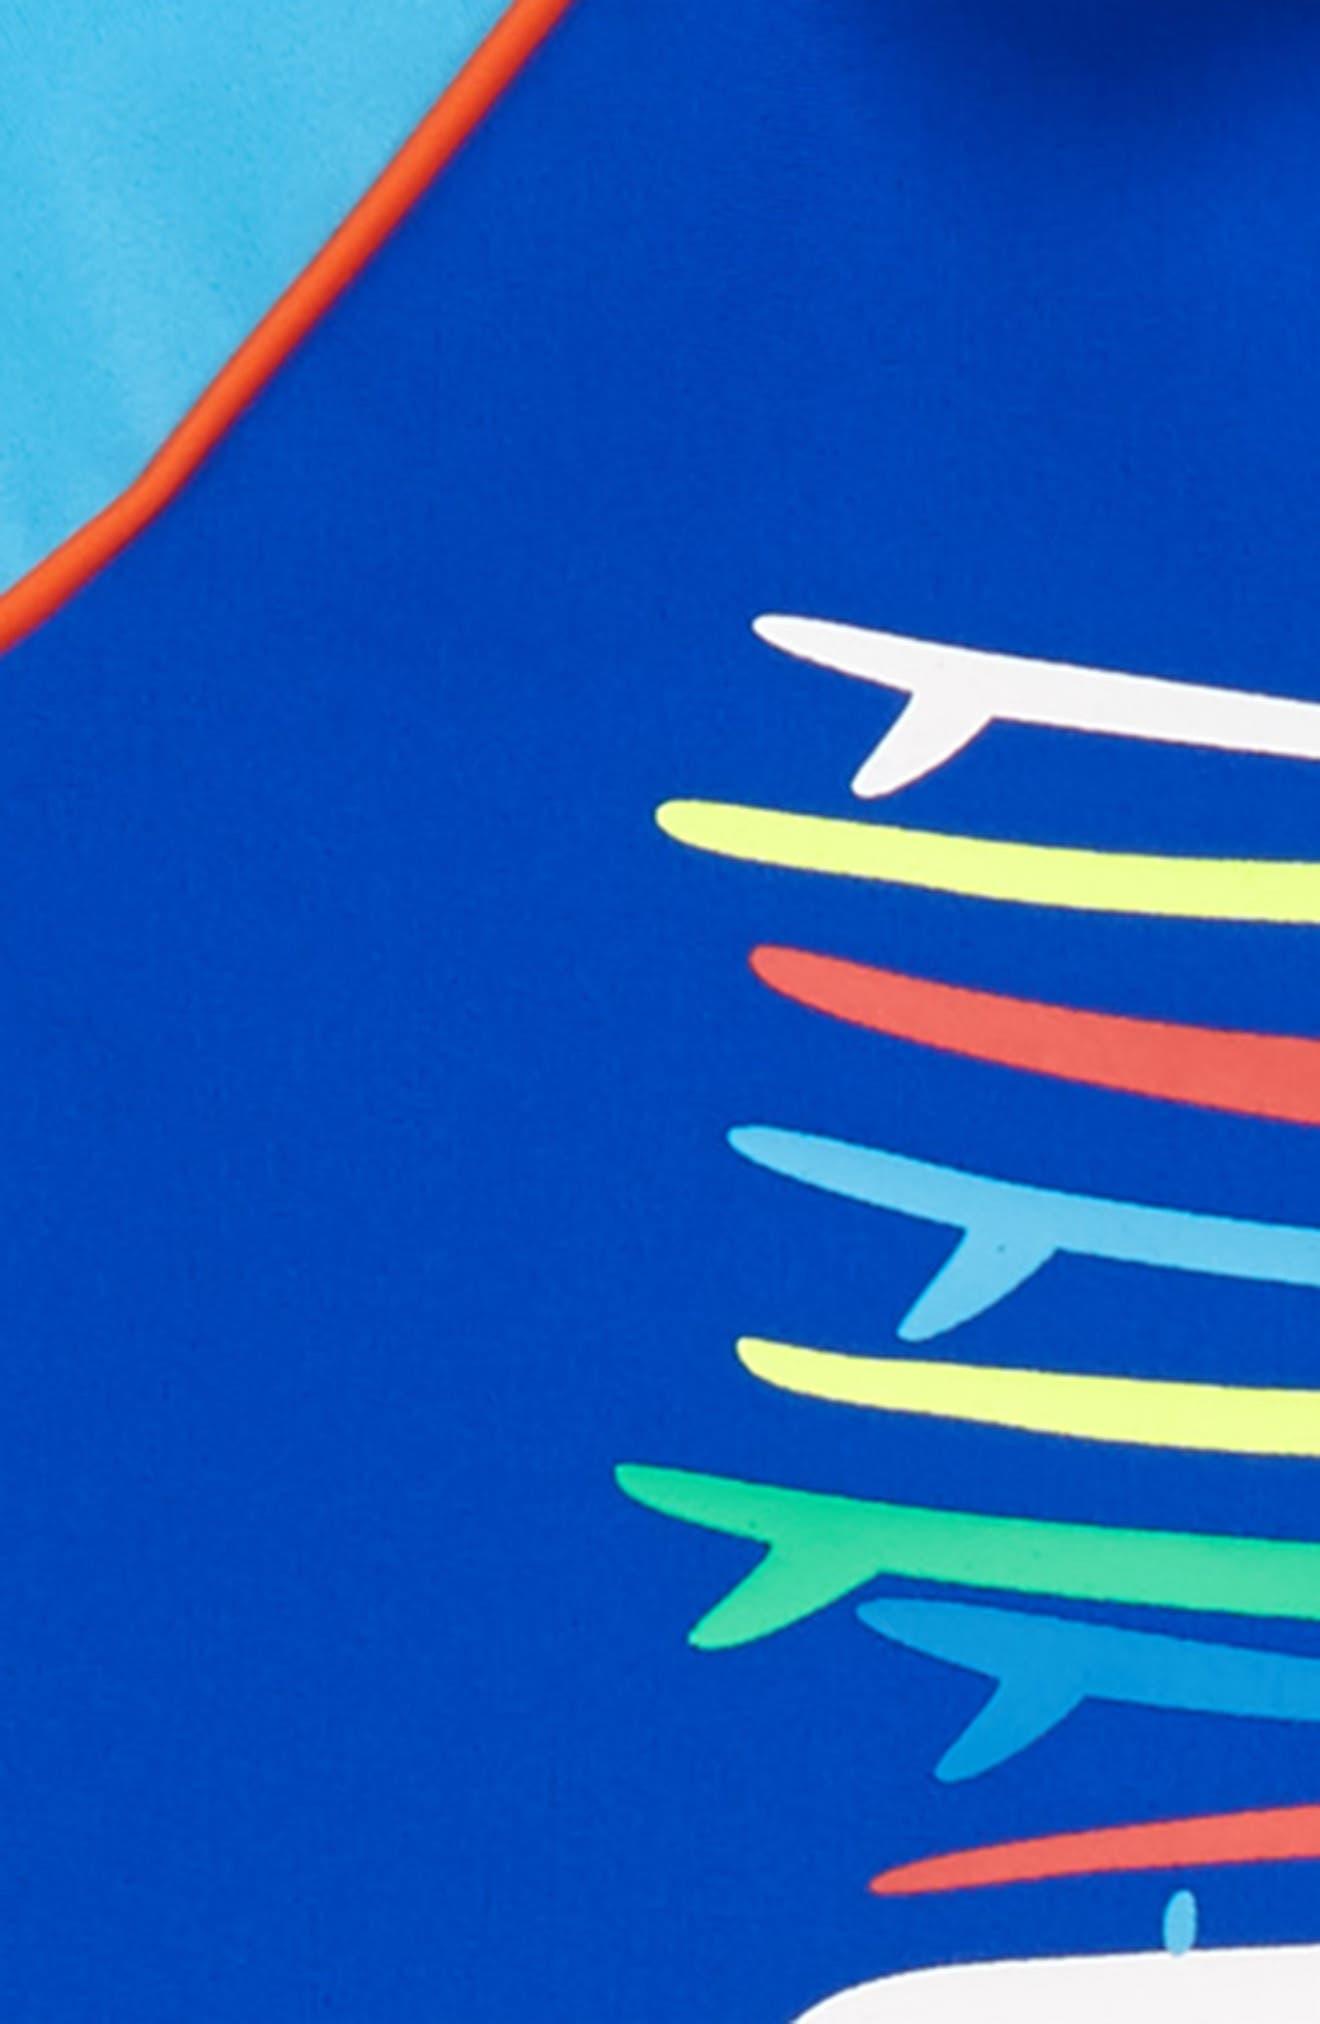 Two-Piece Van Surf Swimsuit,                             Alternate thumbnail 2, color,                             Surfboard Blue Surf Van